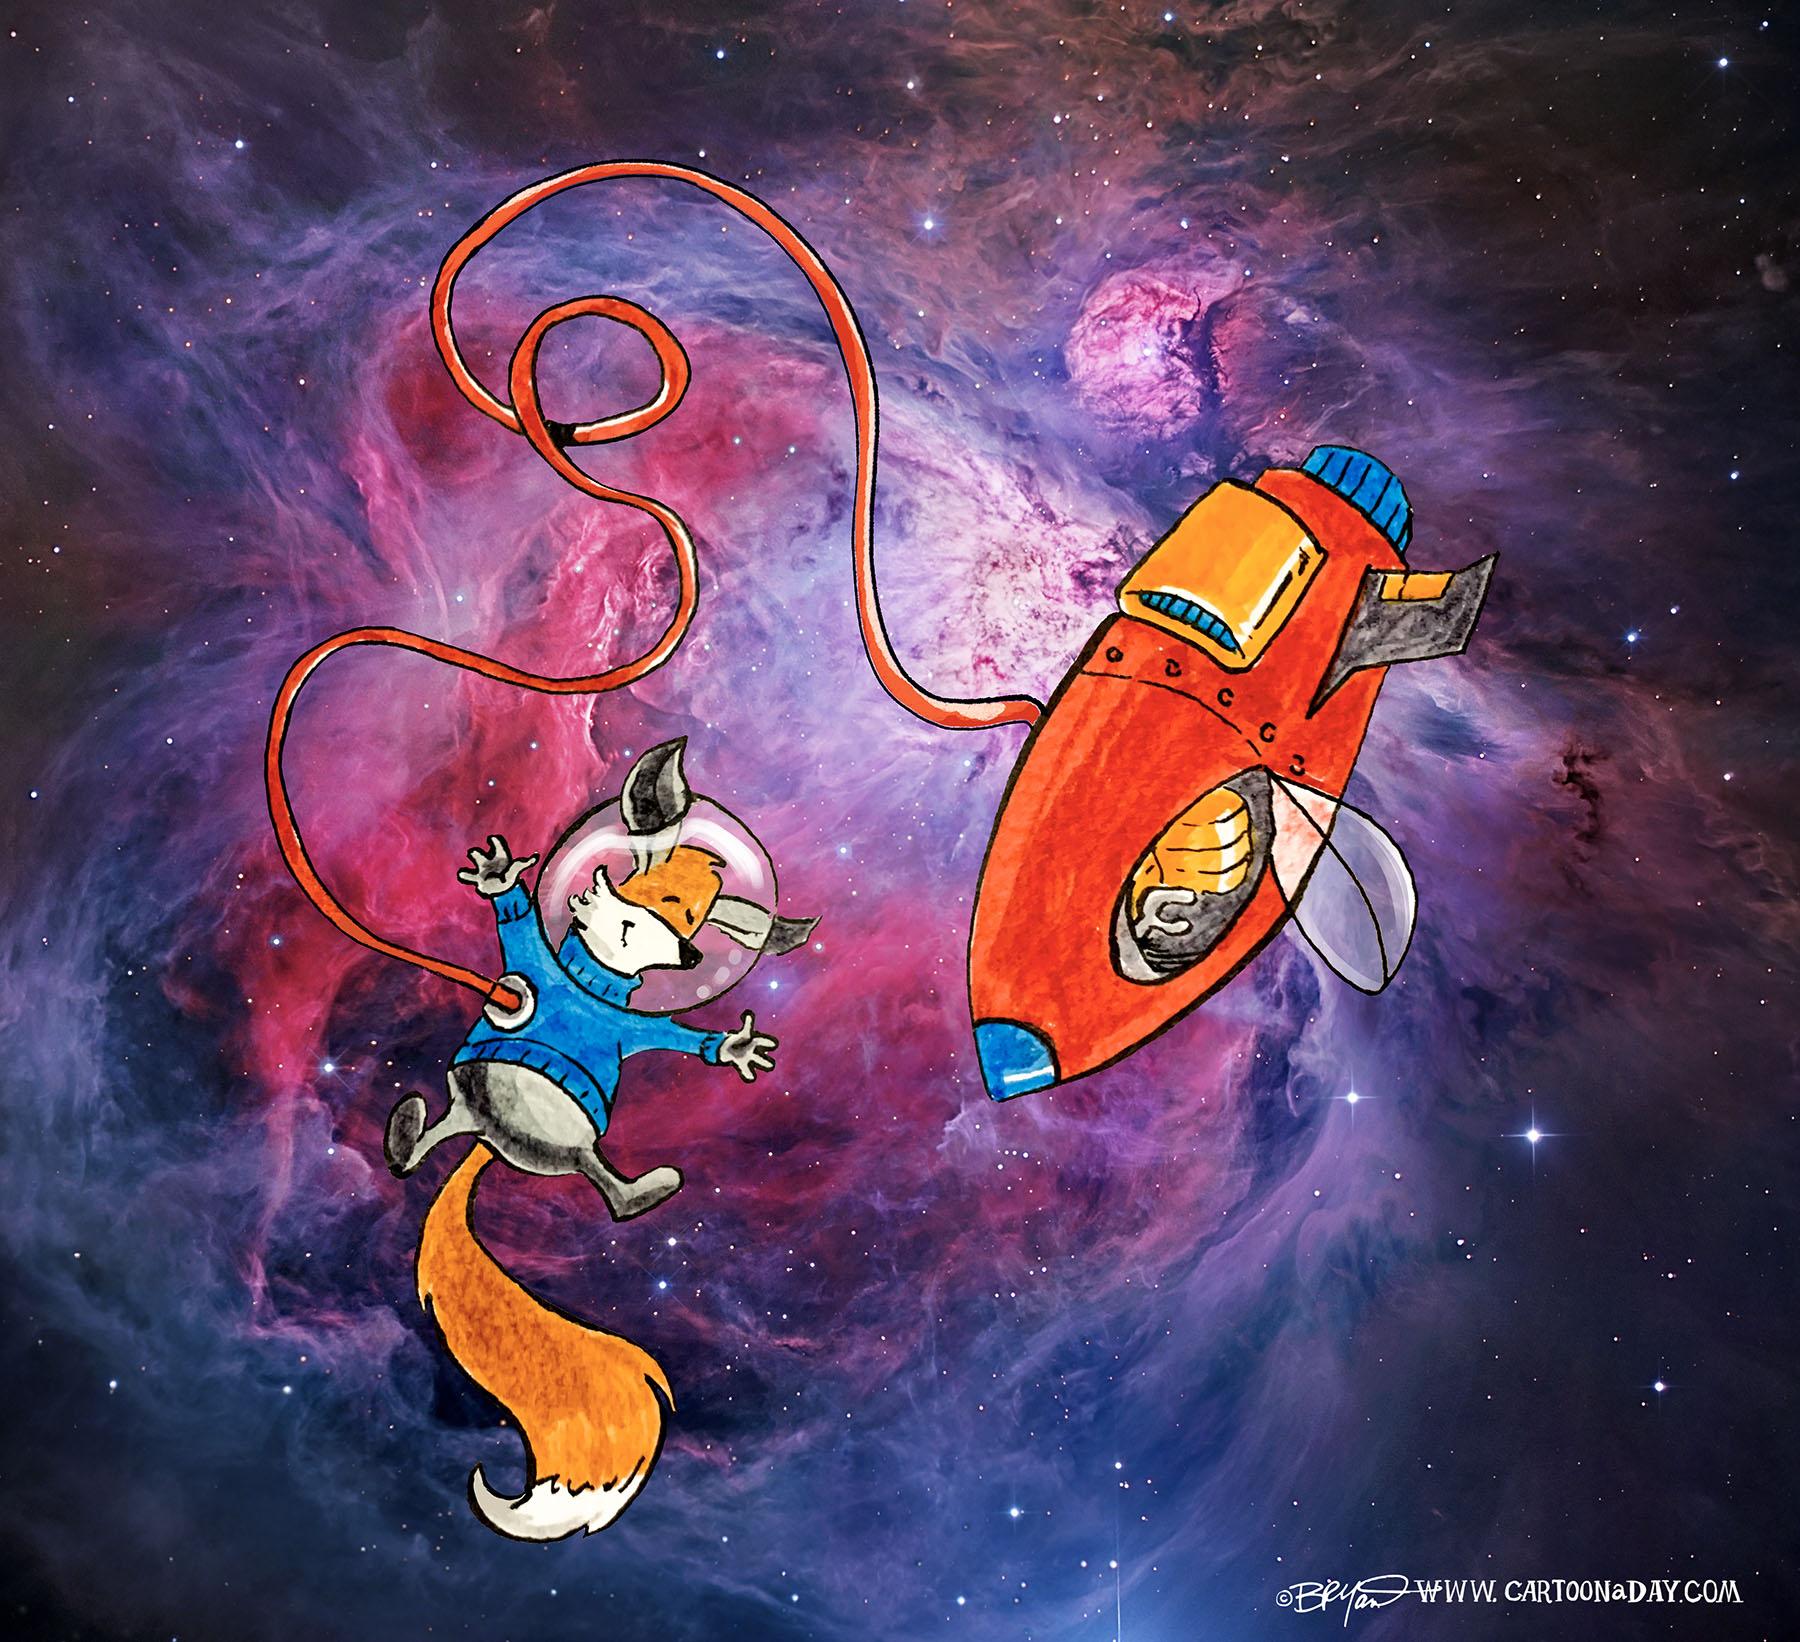 Kit-fox-astronaut-nebula-bright